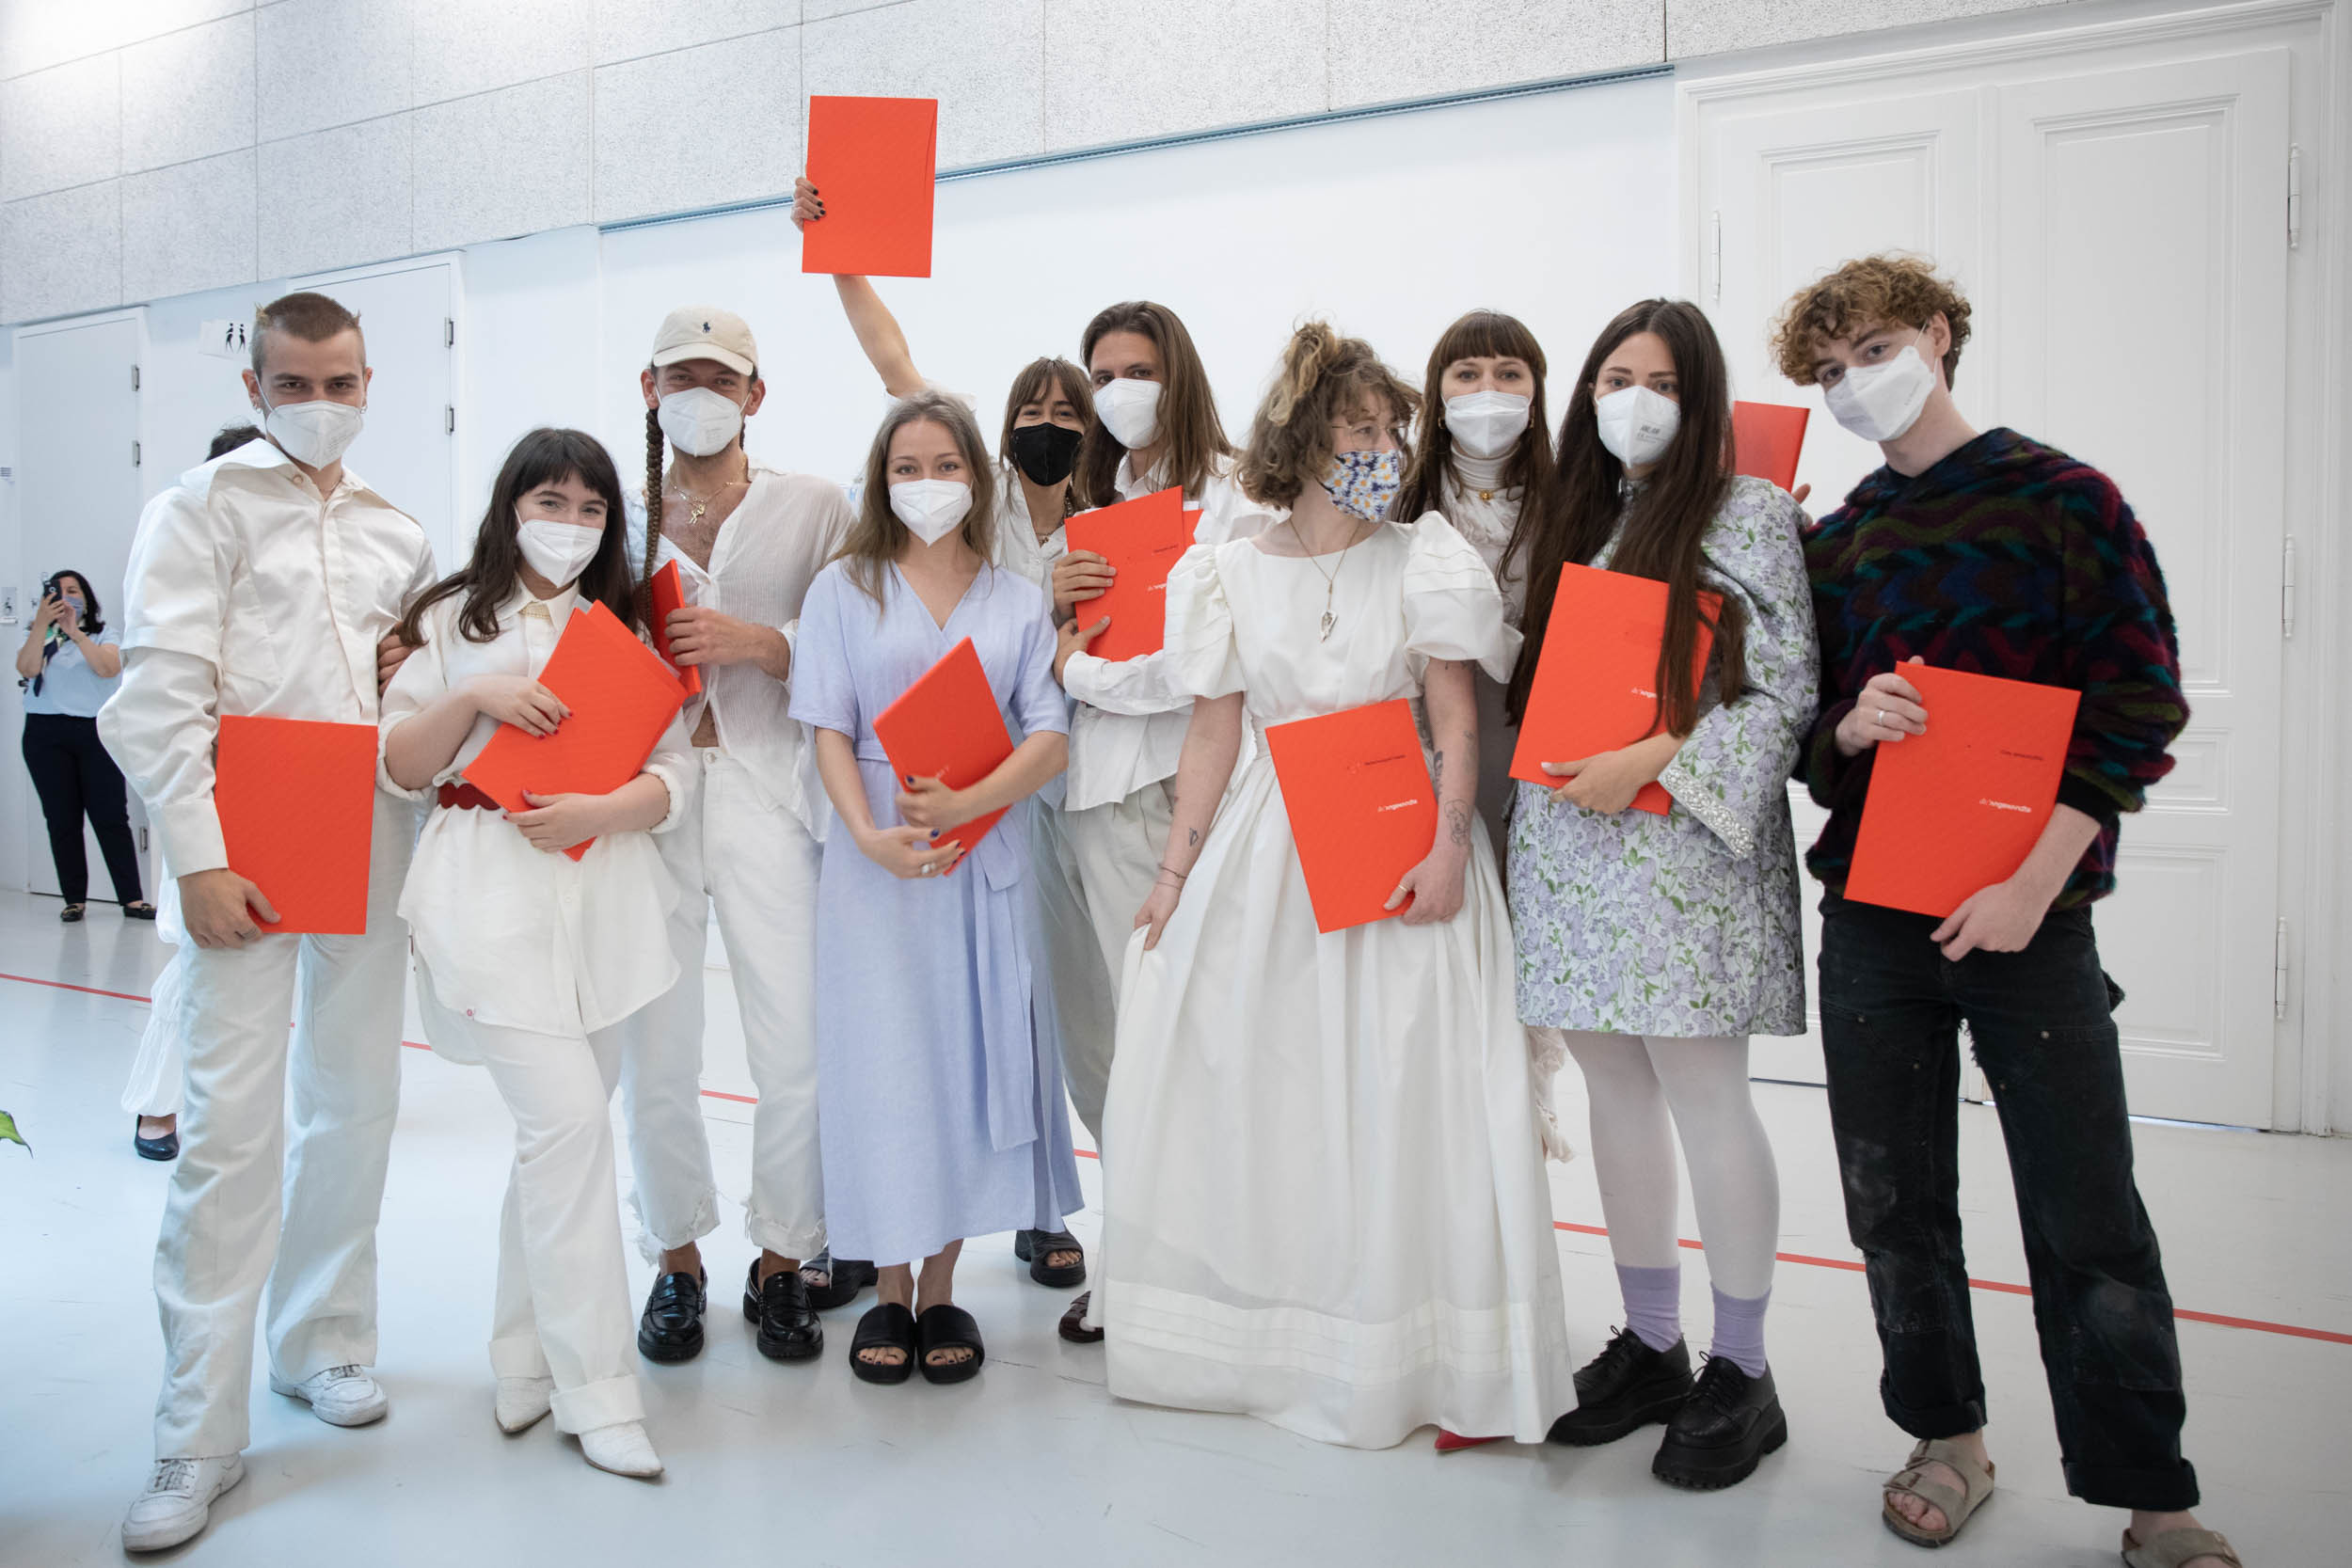 eSeL Foto: Modeklasse @ Die Angewandte Sponsion & Promotion (Univ. für Angewandte Kunst, 2.7.2021)